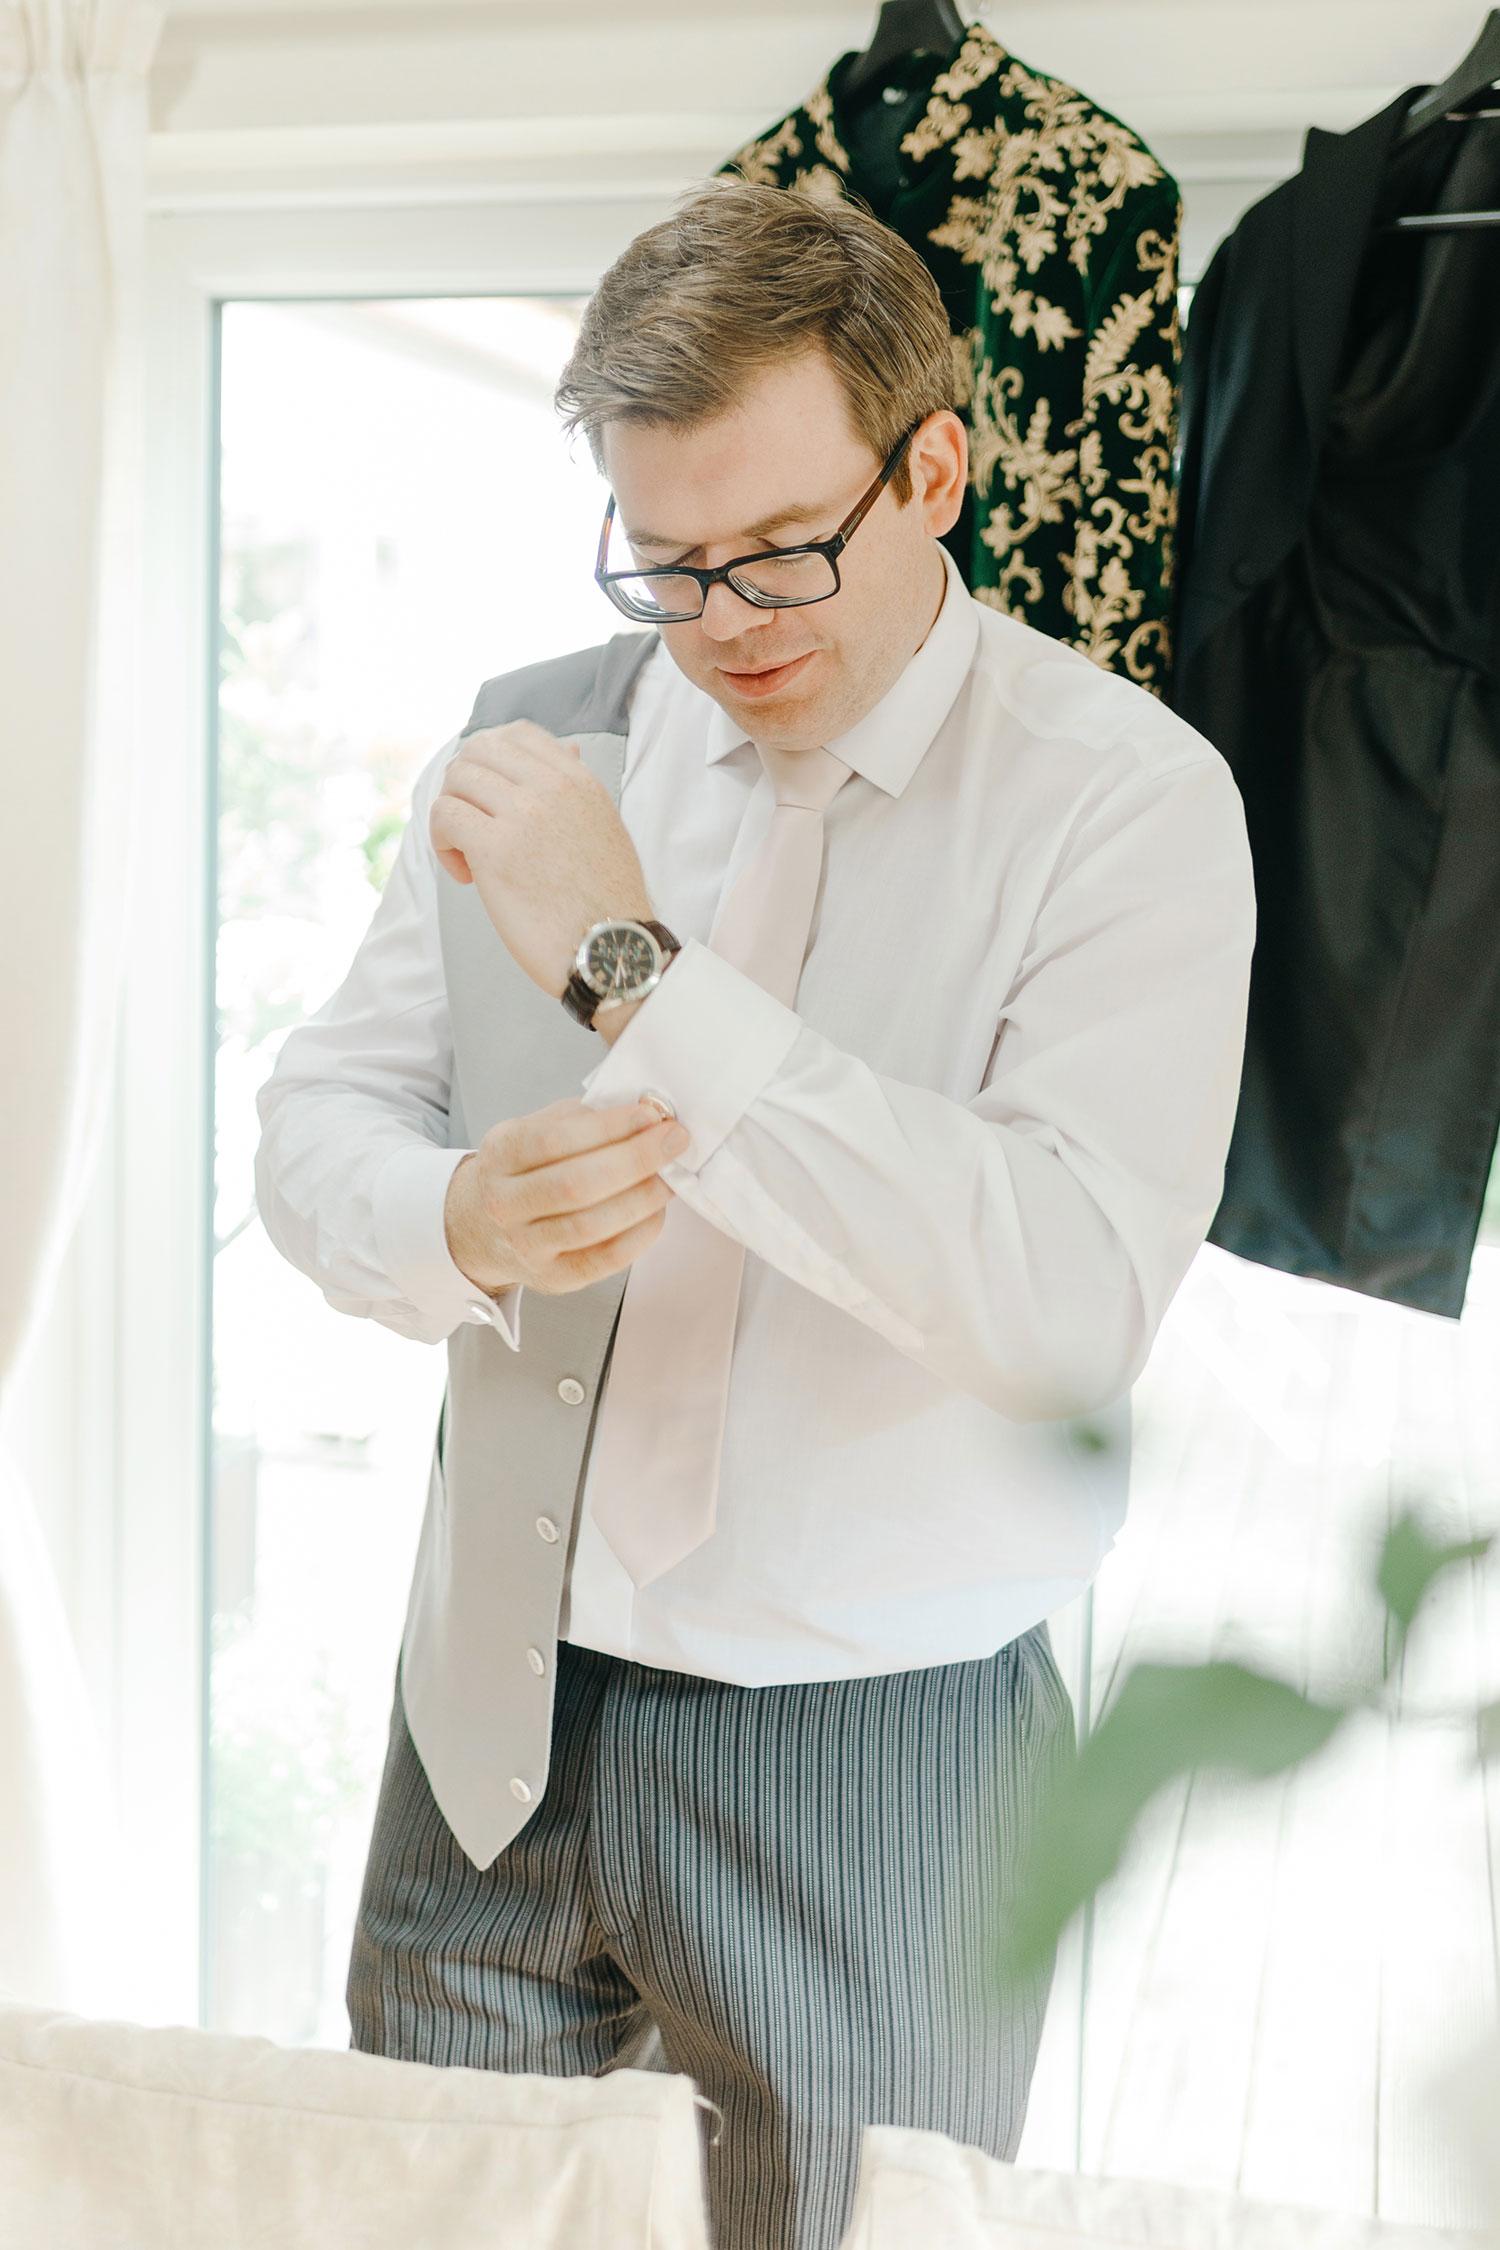 powerscourt-hotel-wedding-photographer-0015_0765.jpg